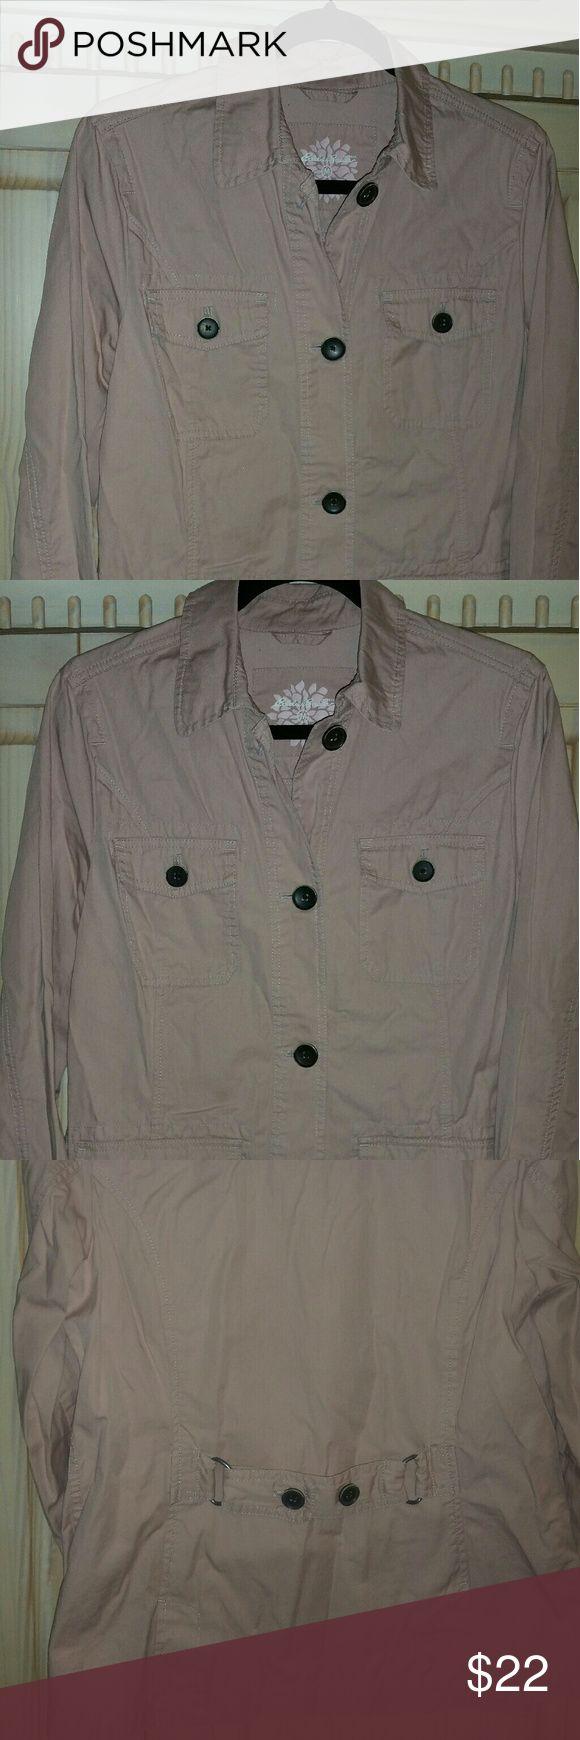 Eddie Bauer Cotton Jacket Beautiful longer cotton jacket in NWOT excellent condition. Dusty rose color. Jackets & Coats Utility Jackets